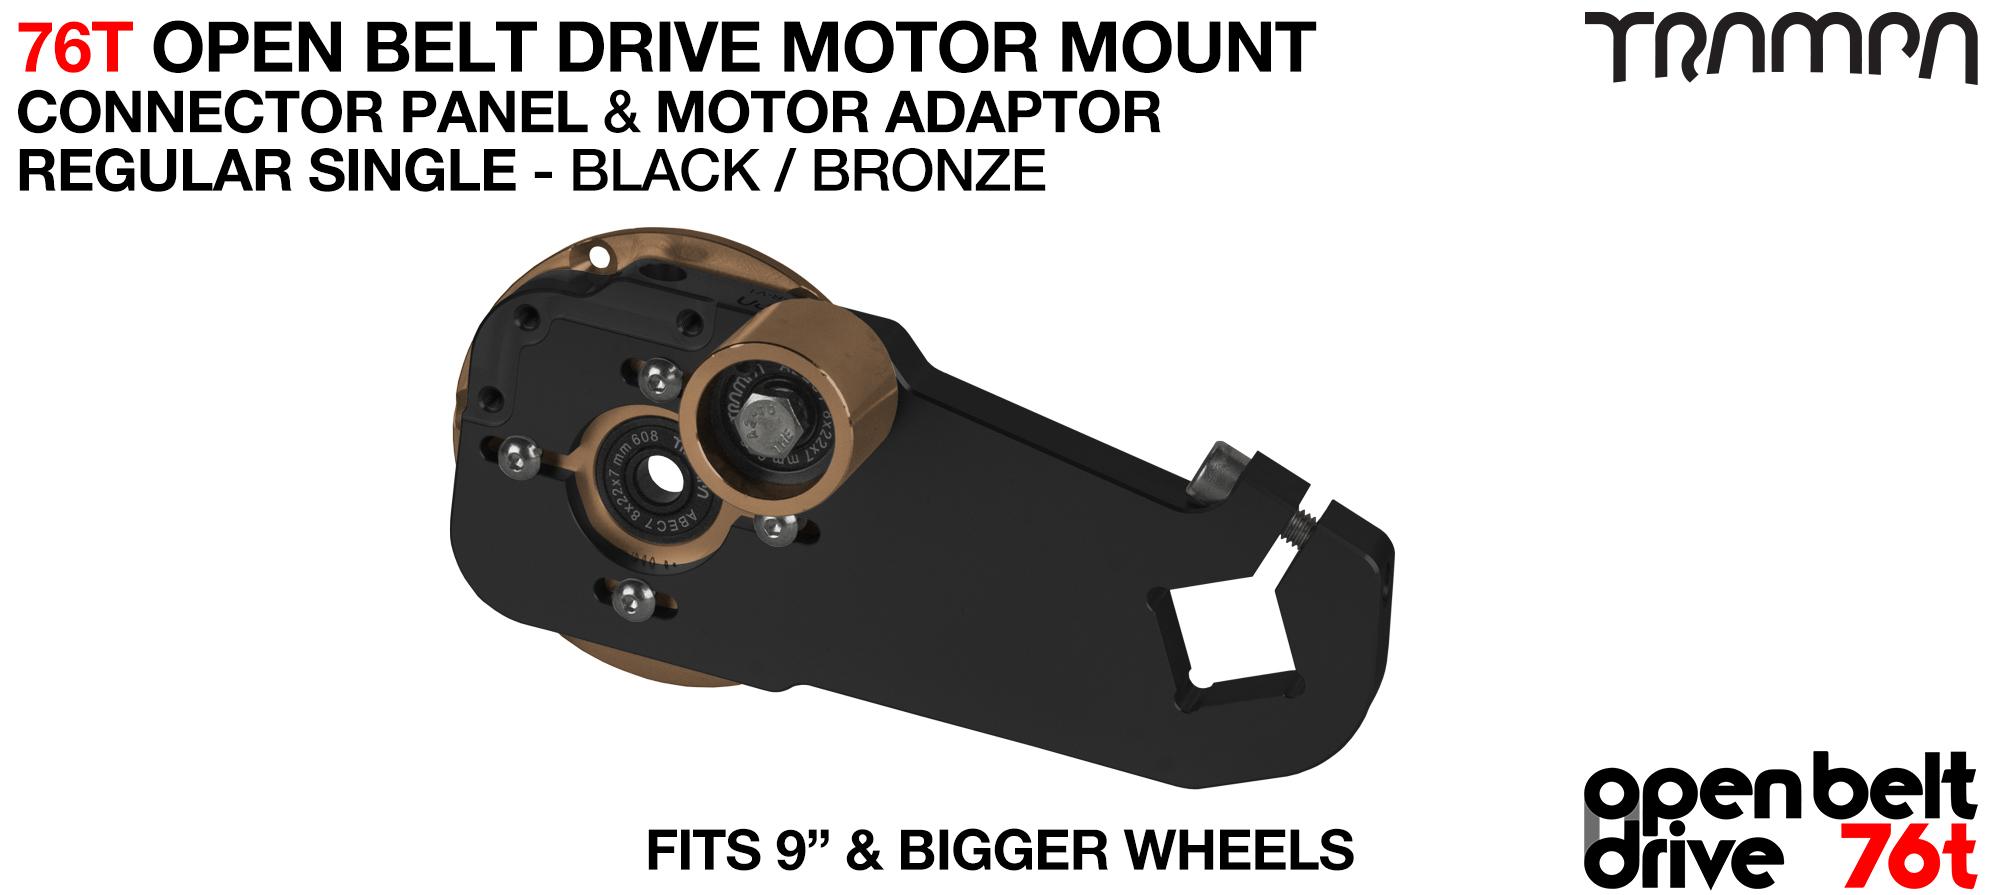 76T Open Belt Drive Motor Mount & Motor Adaptor - SINGLE BRONZE